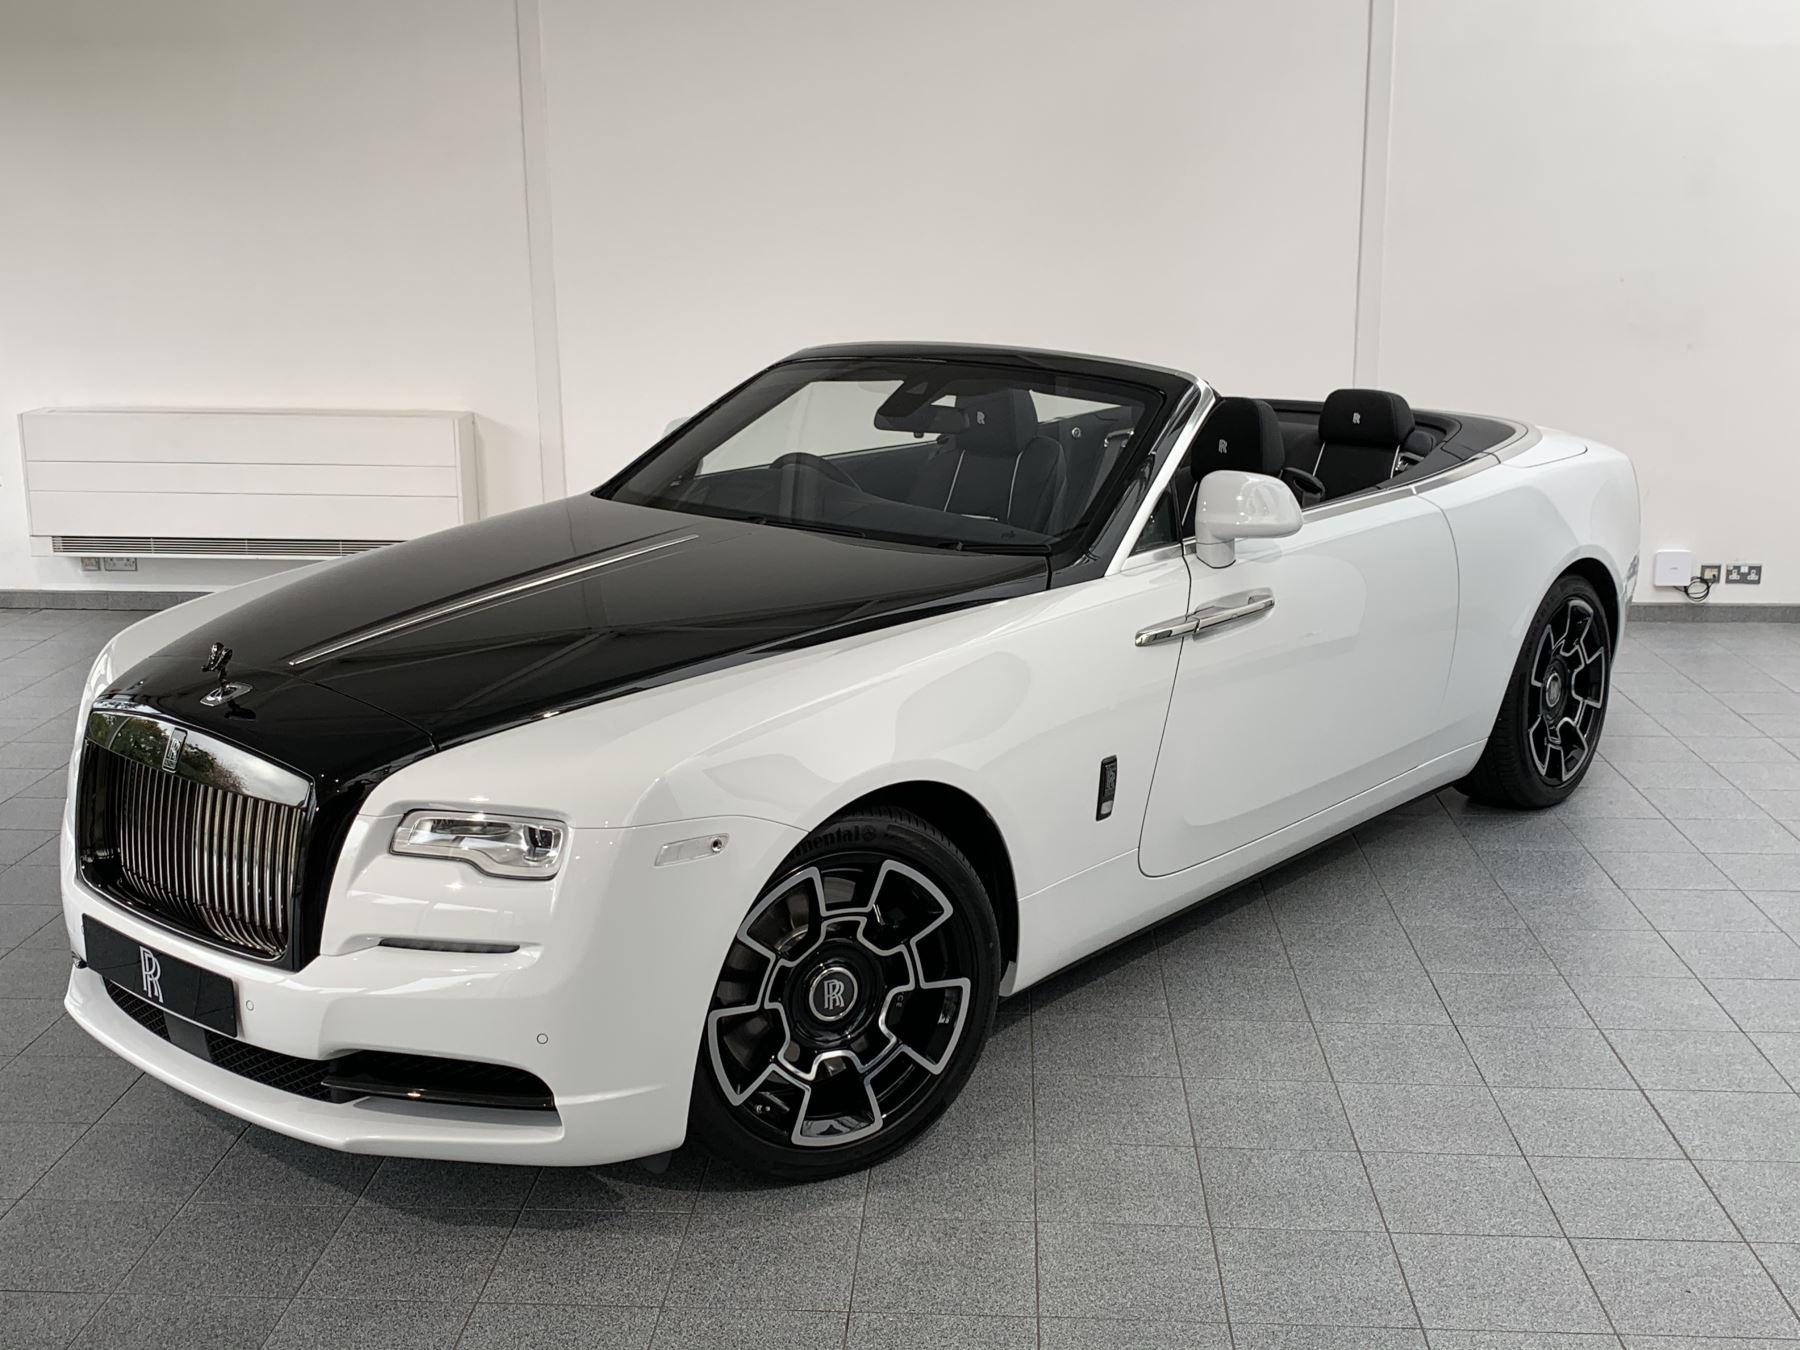 Rolls-Royce Black Badge Dawn Black Badge 2dr Auto 6.6 Automatic Convertible (2020)